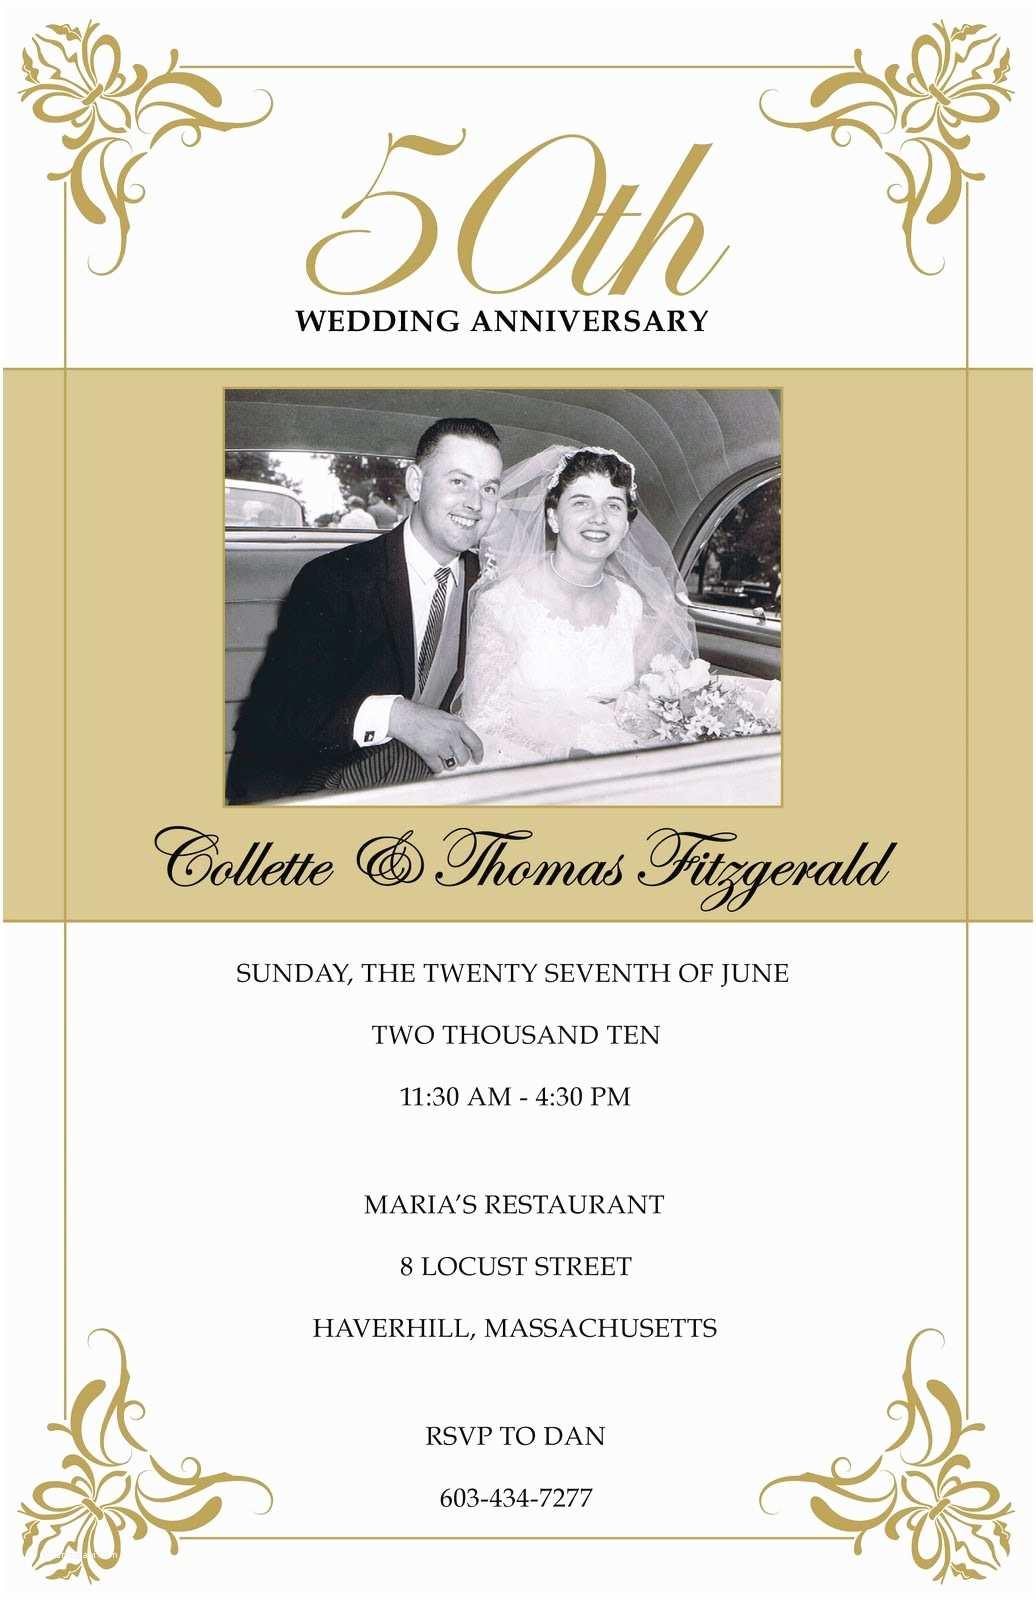 50th Wedding Anniversary Invitations Free Templates Annagraham Design 50th Anniversary